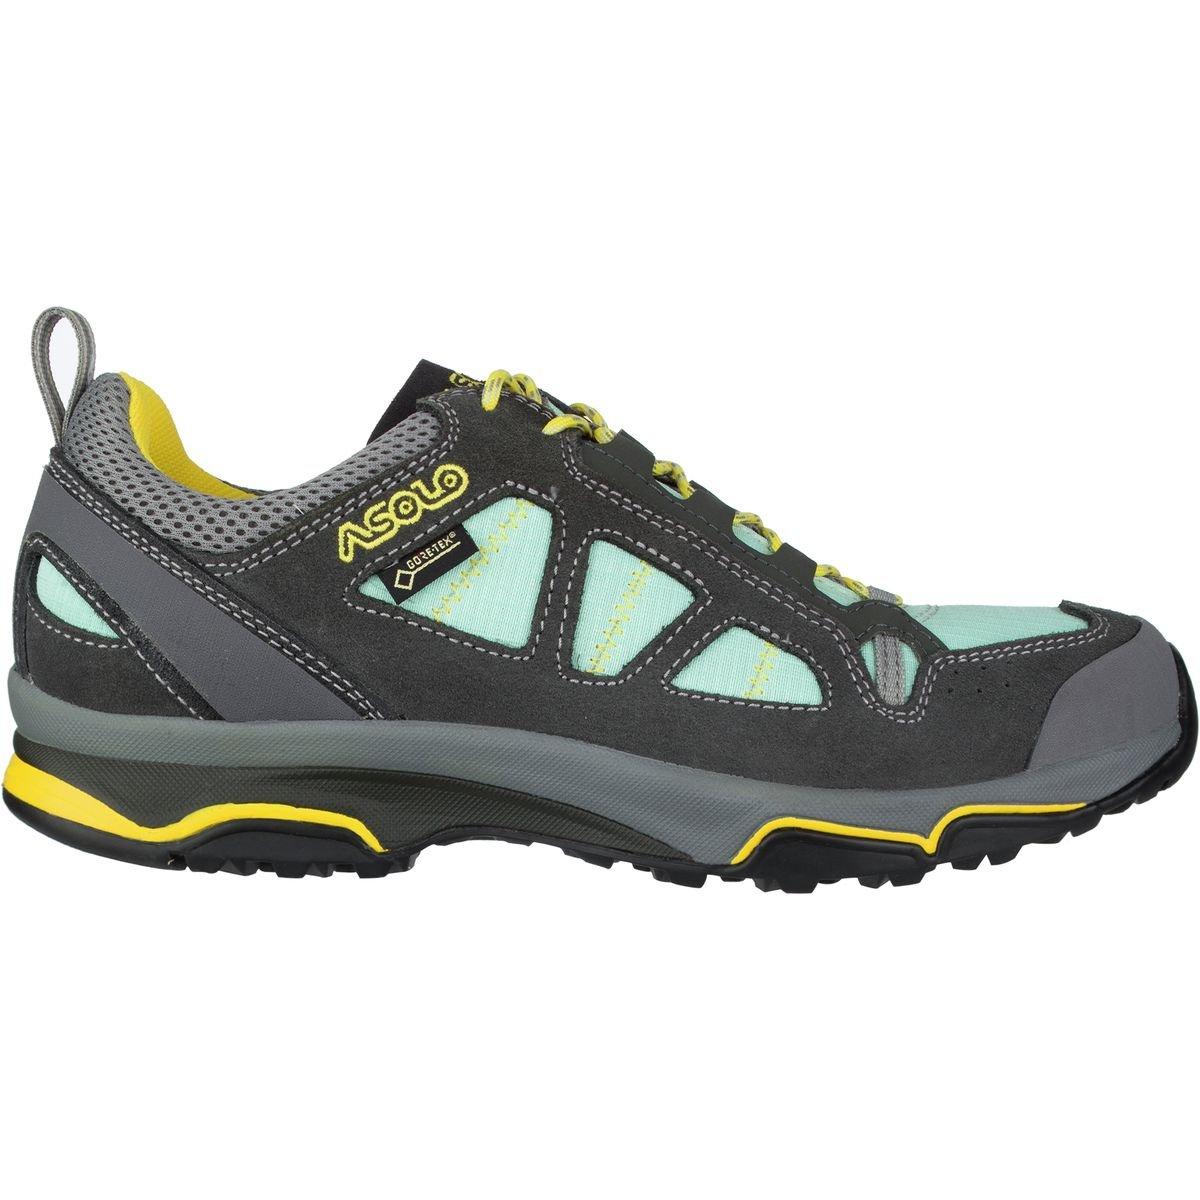 Asolo Megaton GV GTX Hiking Shoe - Women's-Graphite/Pool A40011-Graphite/Pool Side-6.5 by Asolo (Image #1)